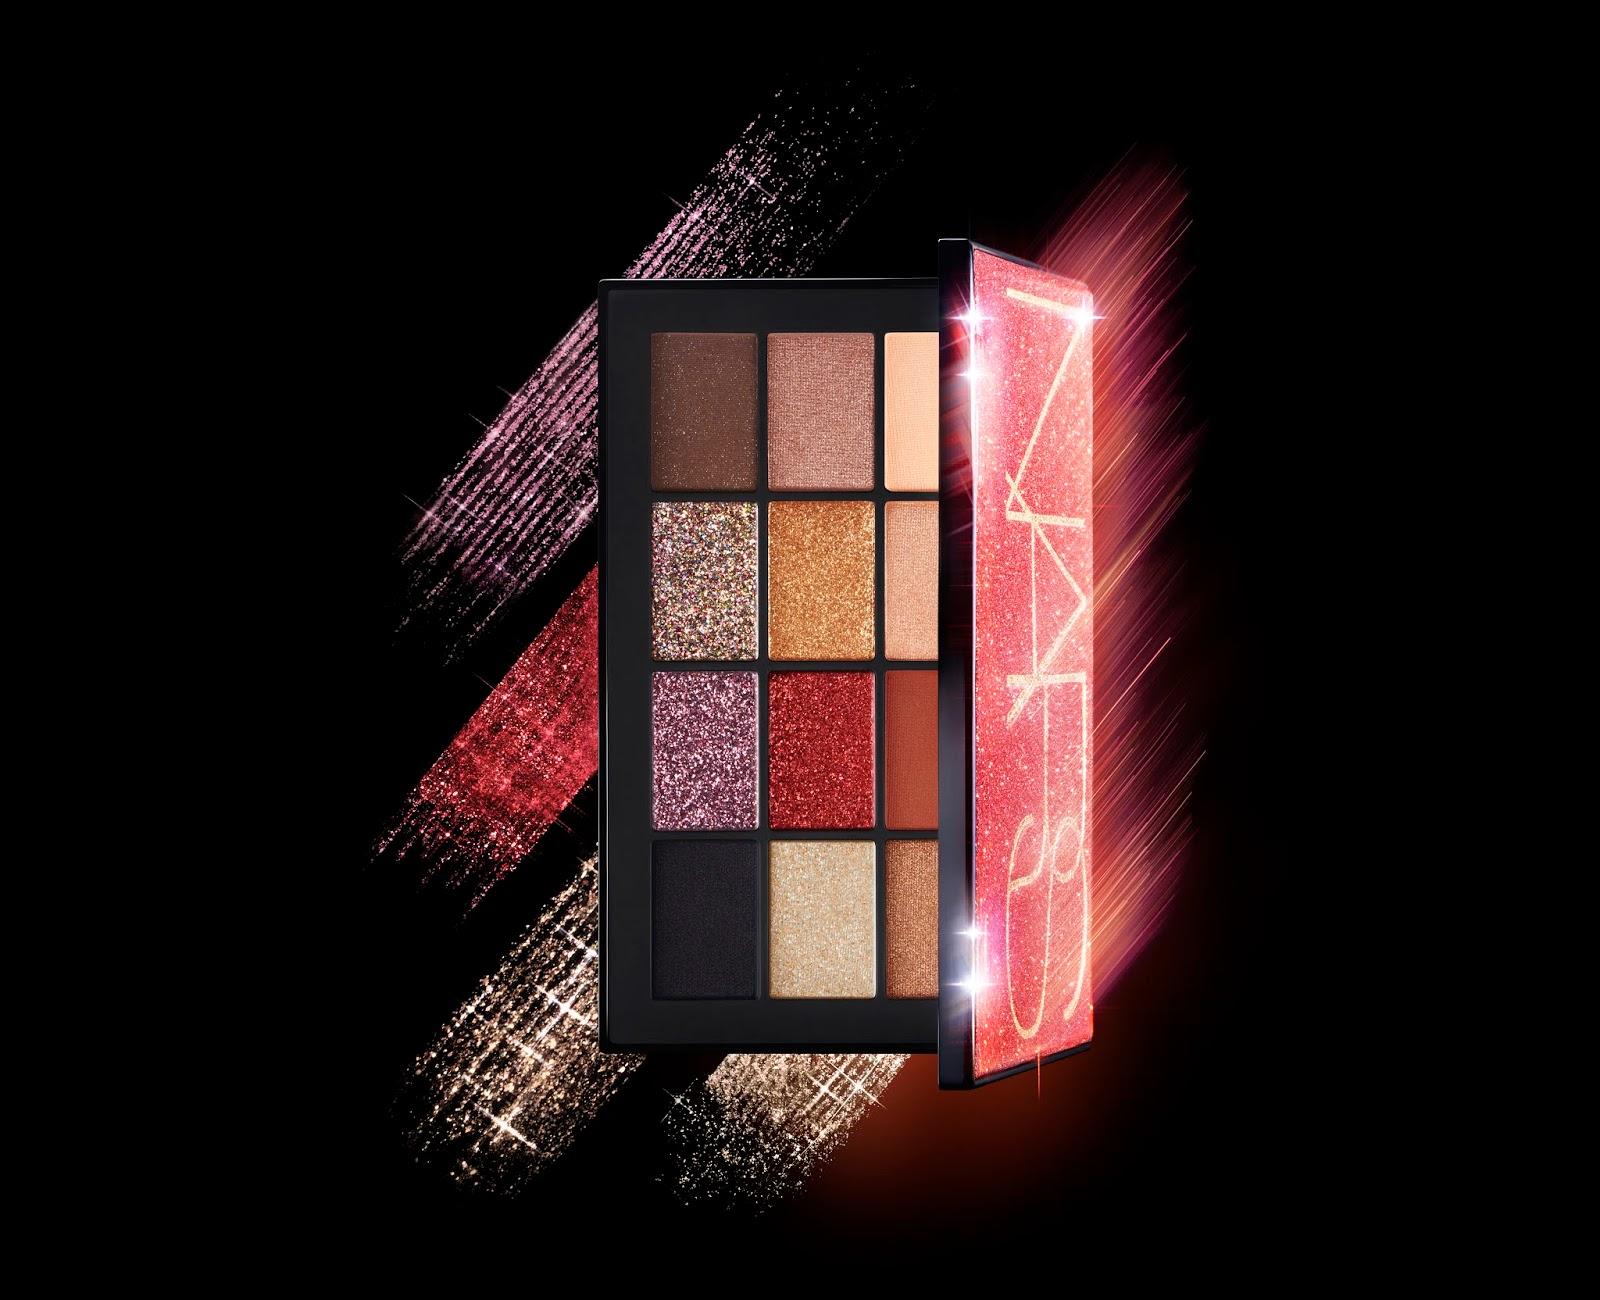 NARS-Studio-54-Inferno-Eyeshadow-Palette-Stylized-Image